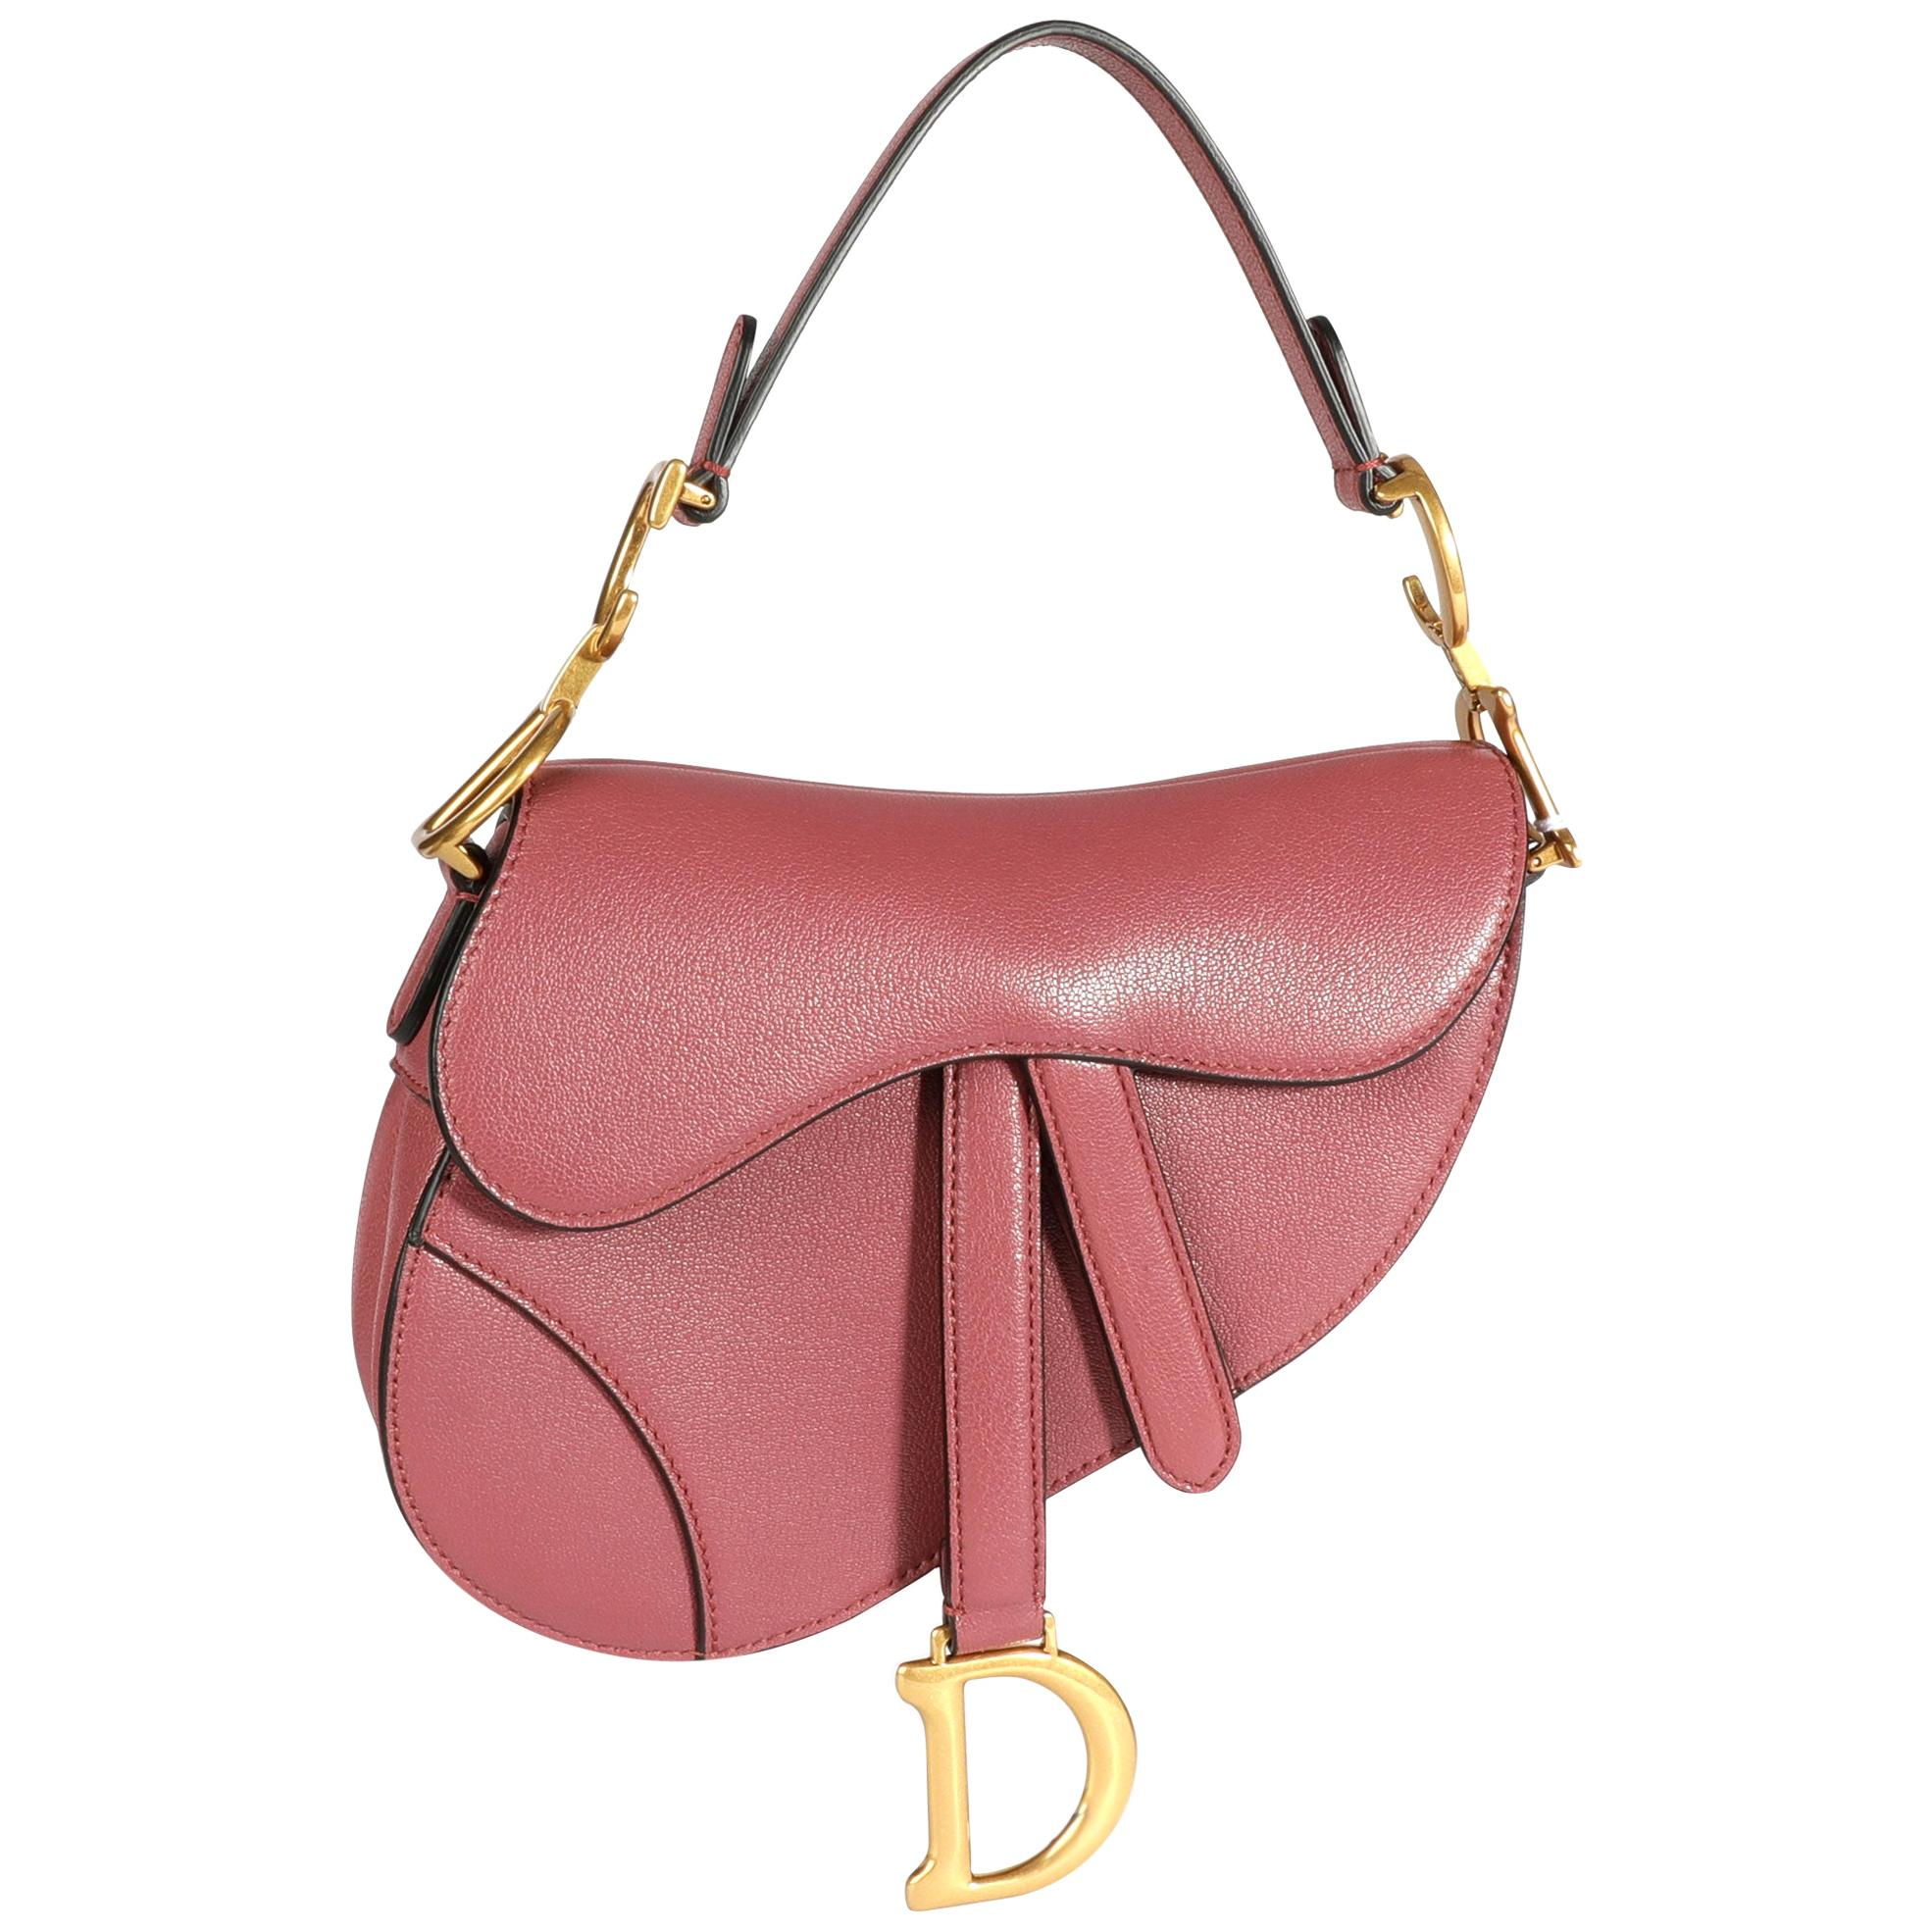 Dior Mallow Rose Shiny Goatskin Leather Mini Saddle Bag with Shoulder Strap